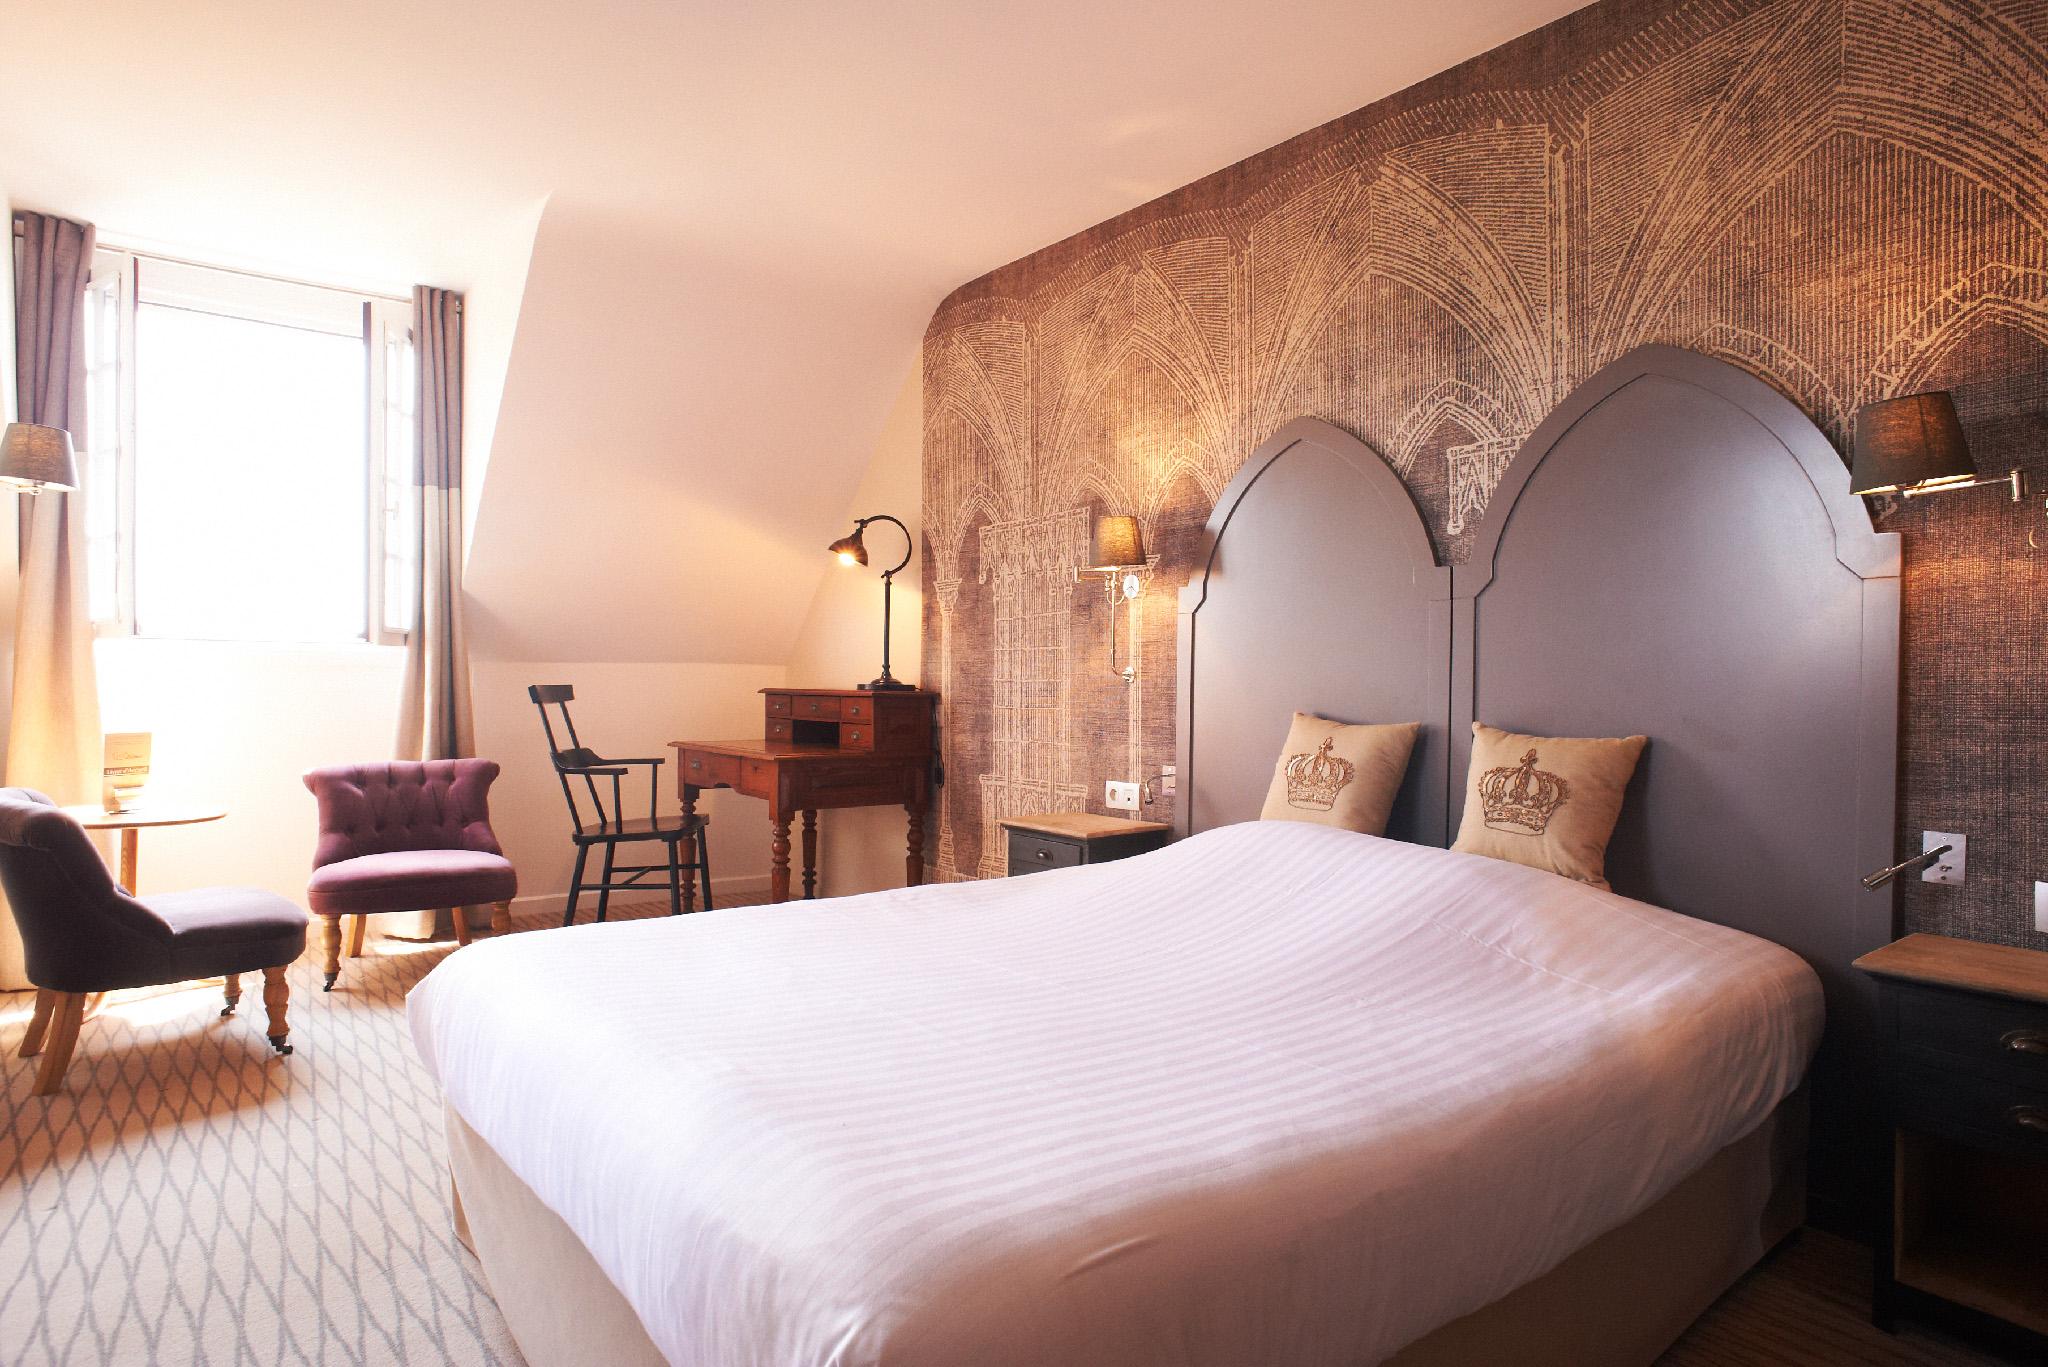 69_photographie_hotel_restaurant_nantes